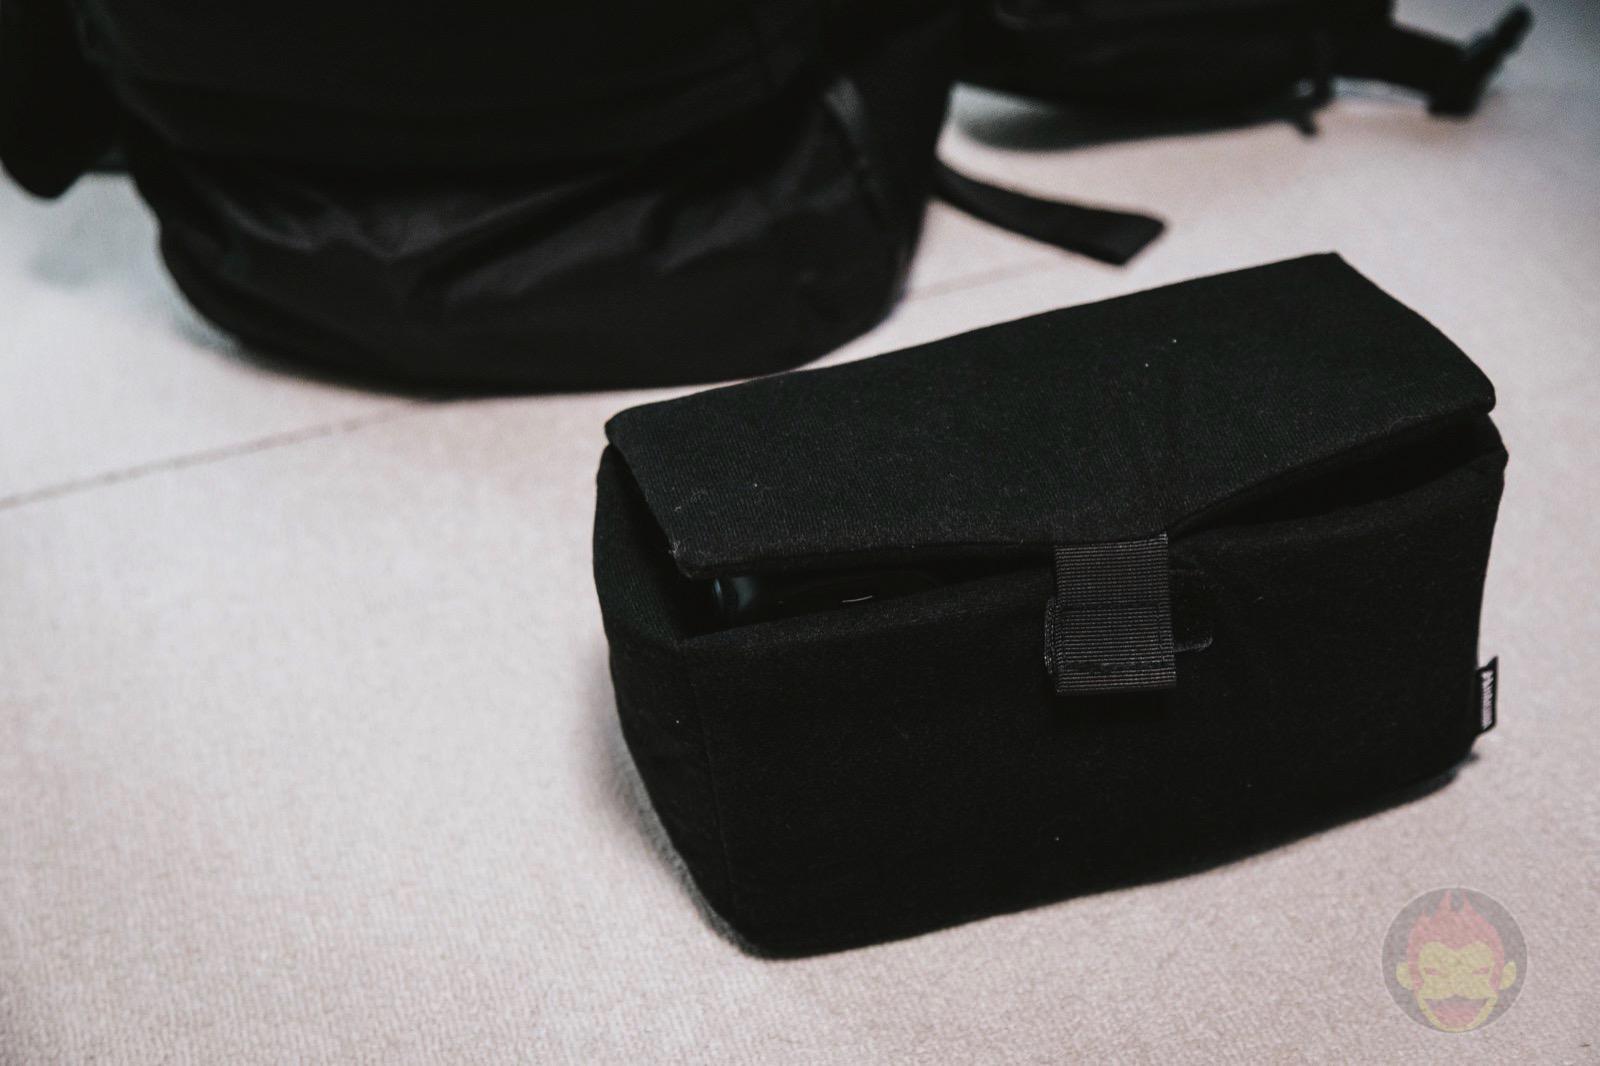 Hakuba-Camerabag-Innerbox-Review-11.jpg